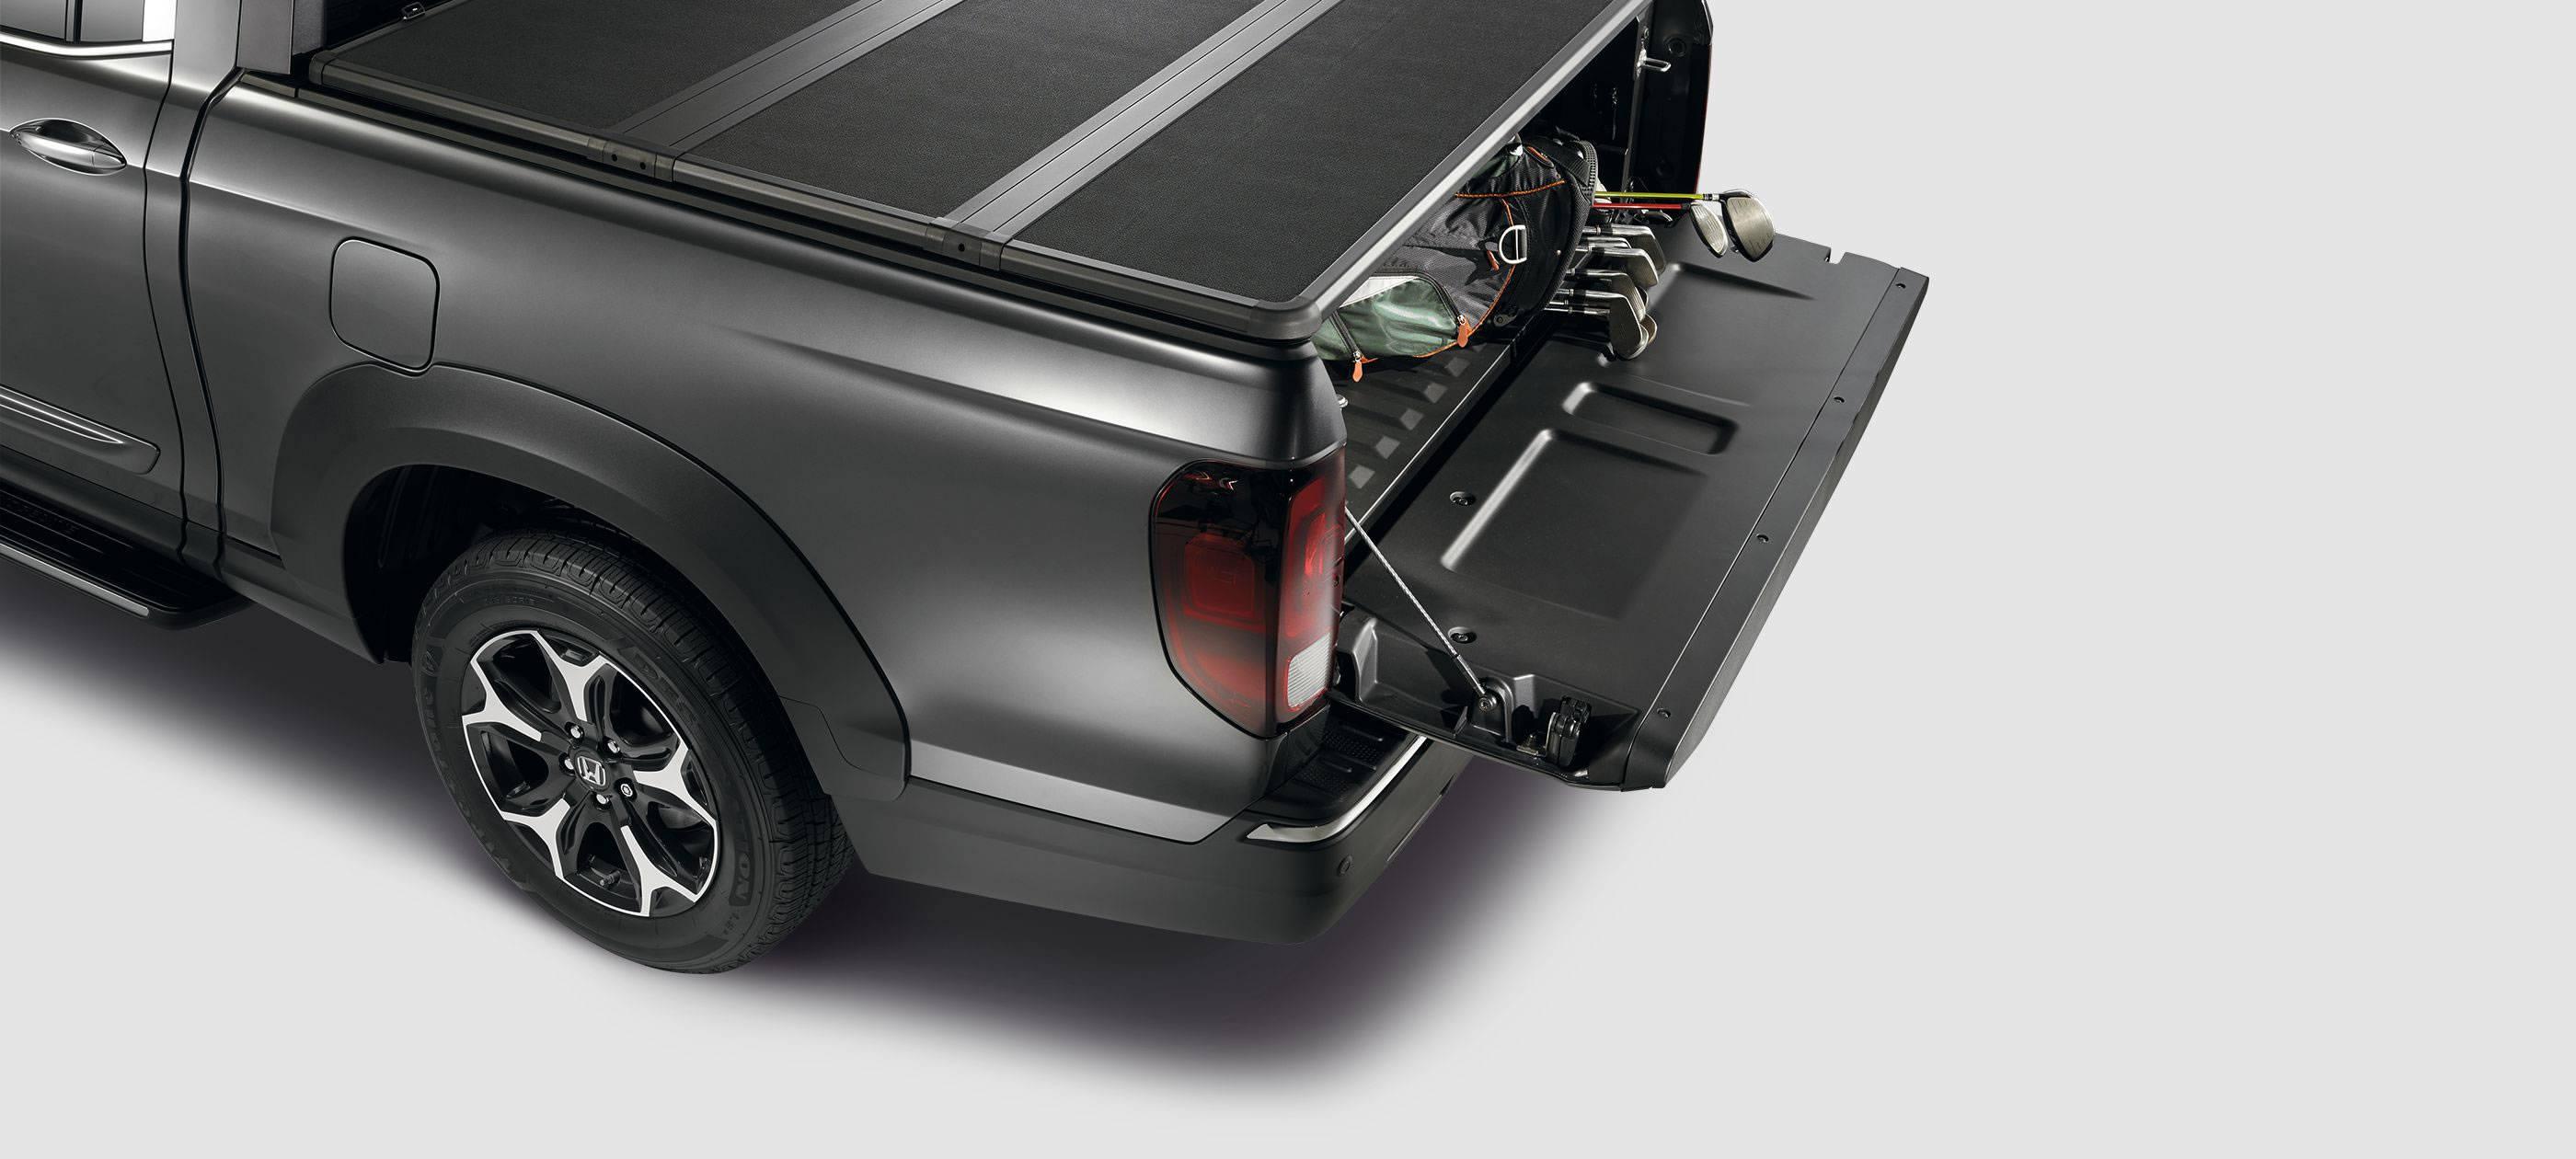 2017 Honda Ridgeline Tonneau Cover